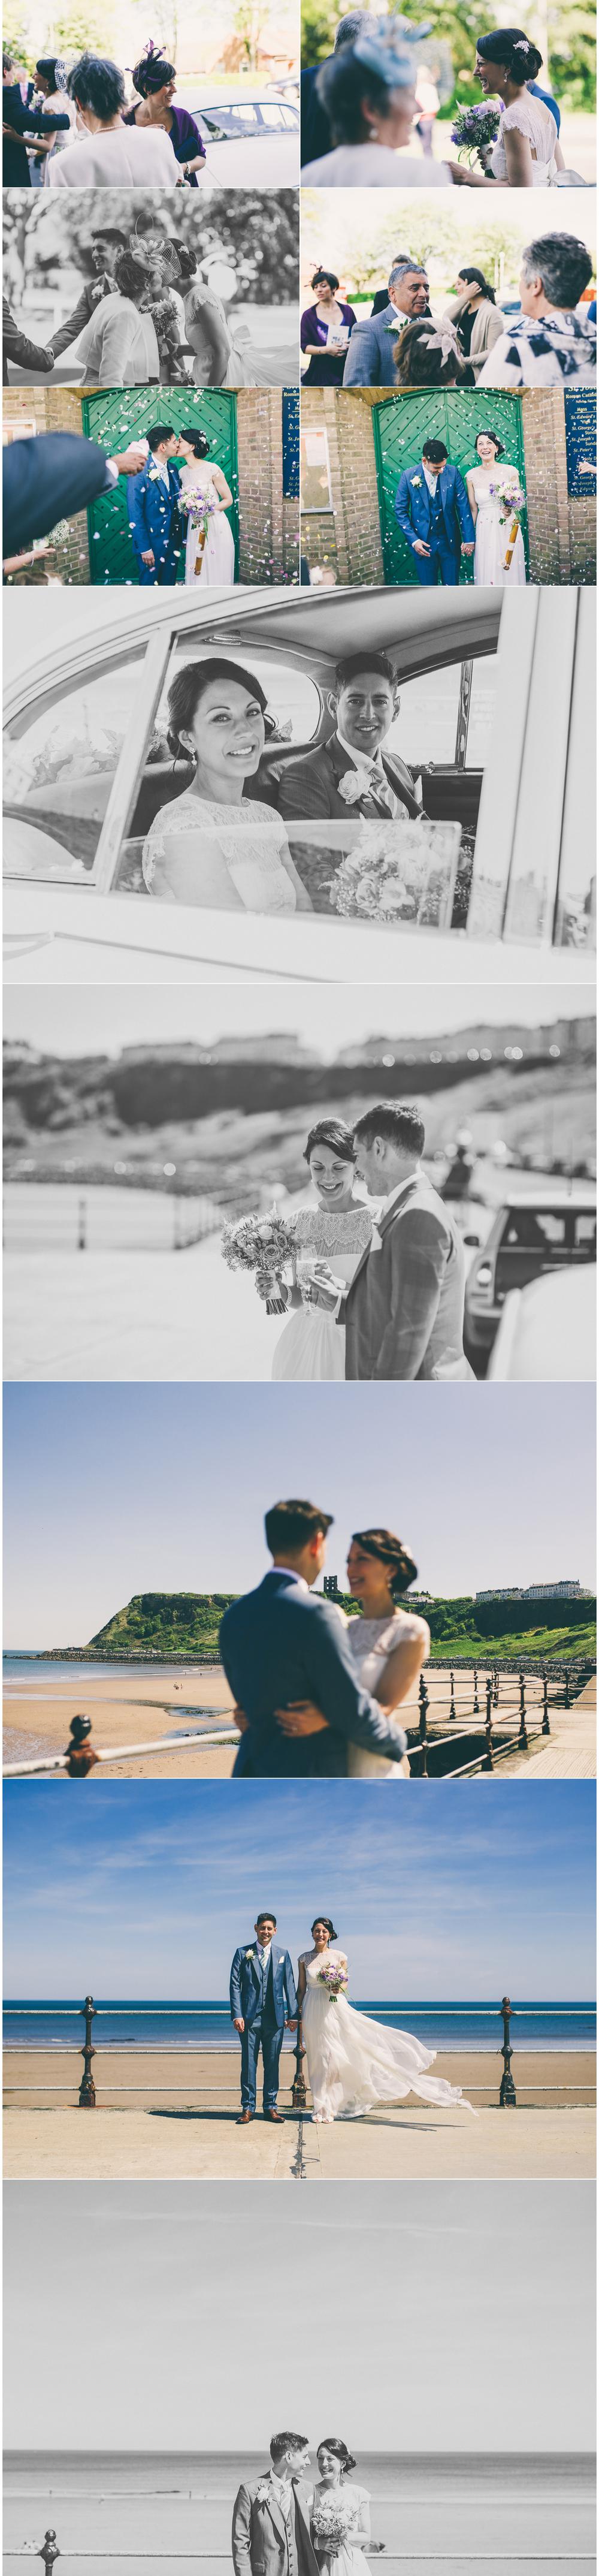 Neil_Jackson_Photographic_Scarborough_York_Yorkshire_Wedding_Photographer_Julie_Jon_Black_Swan_Helmsley_Wedding_Shoot_Blog6